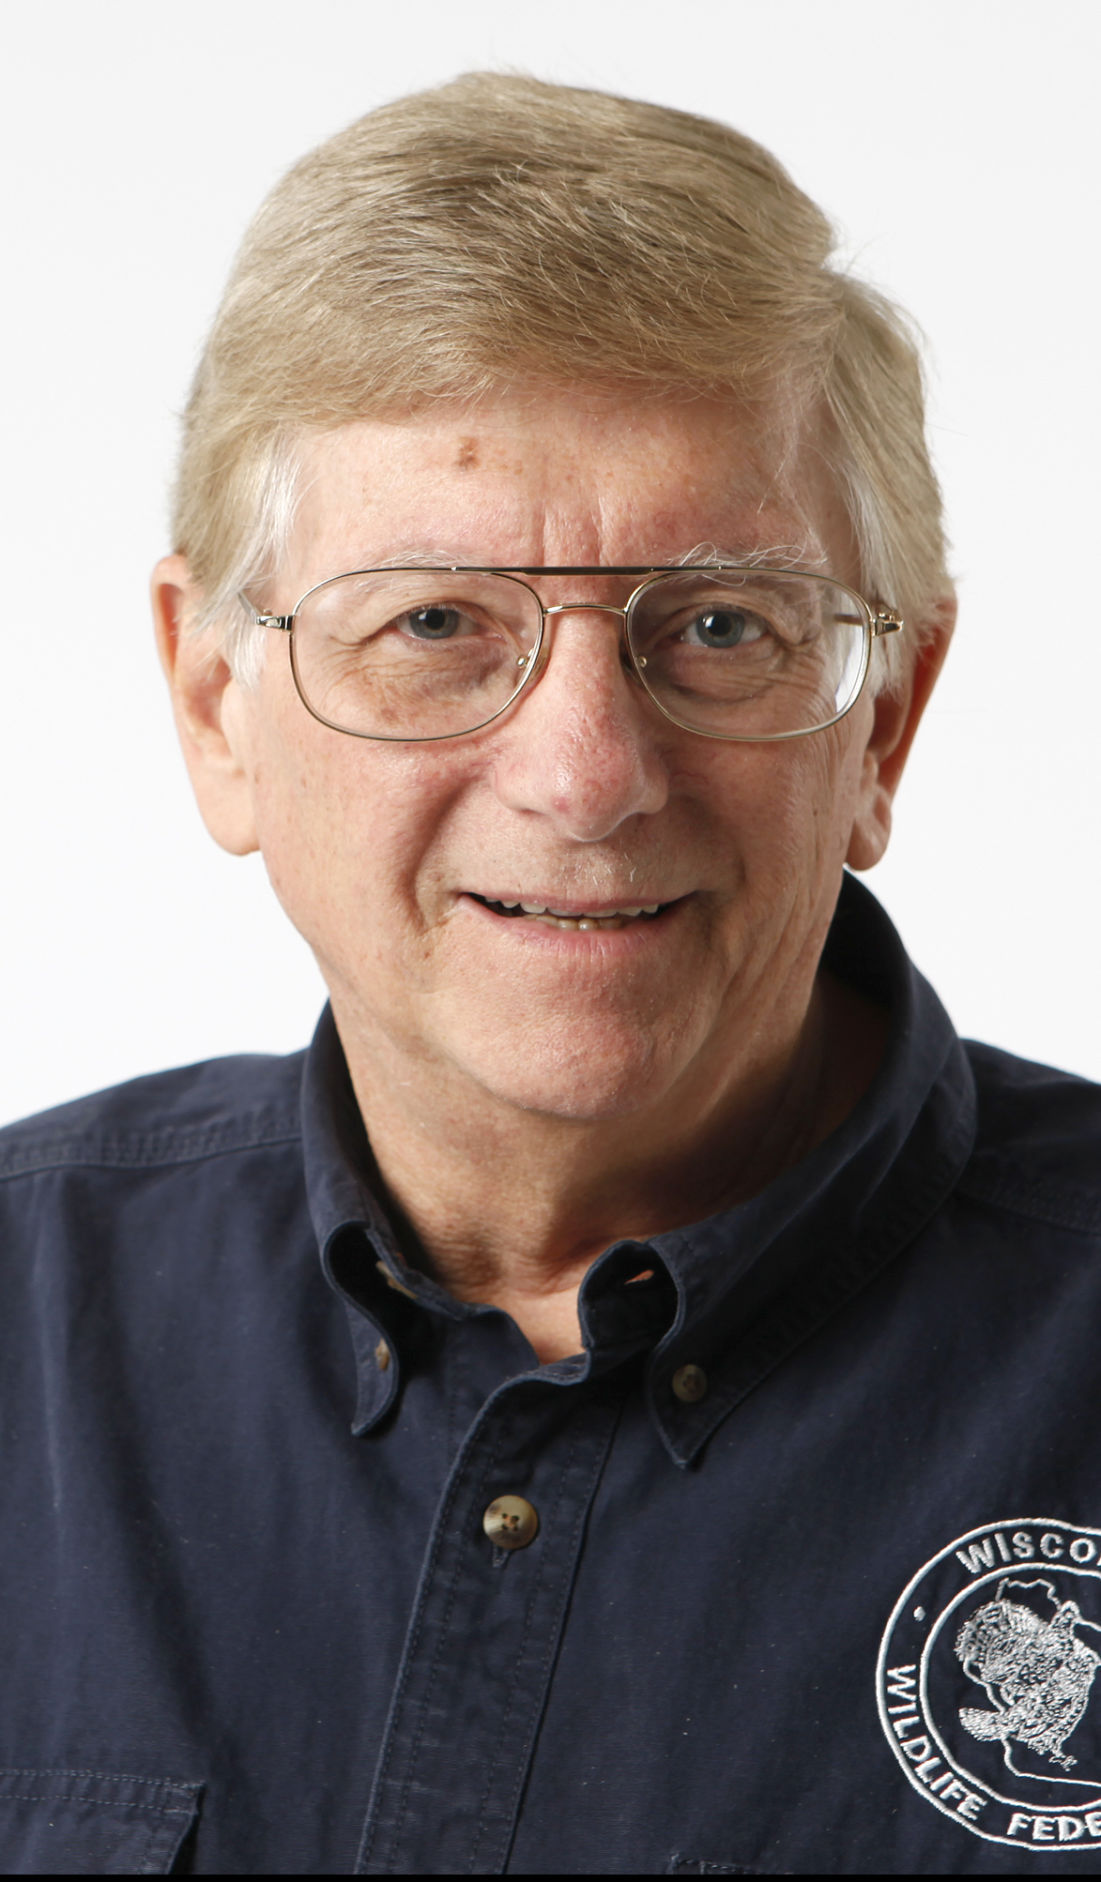 George Meyer